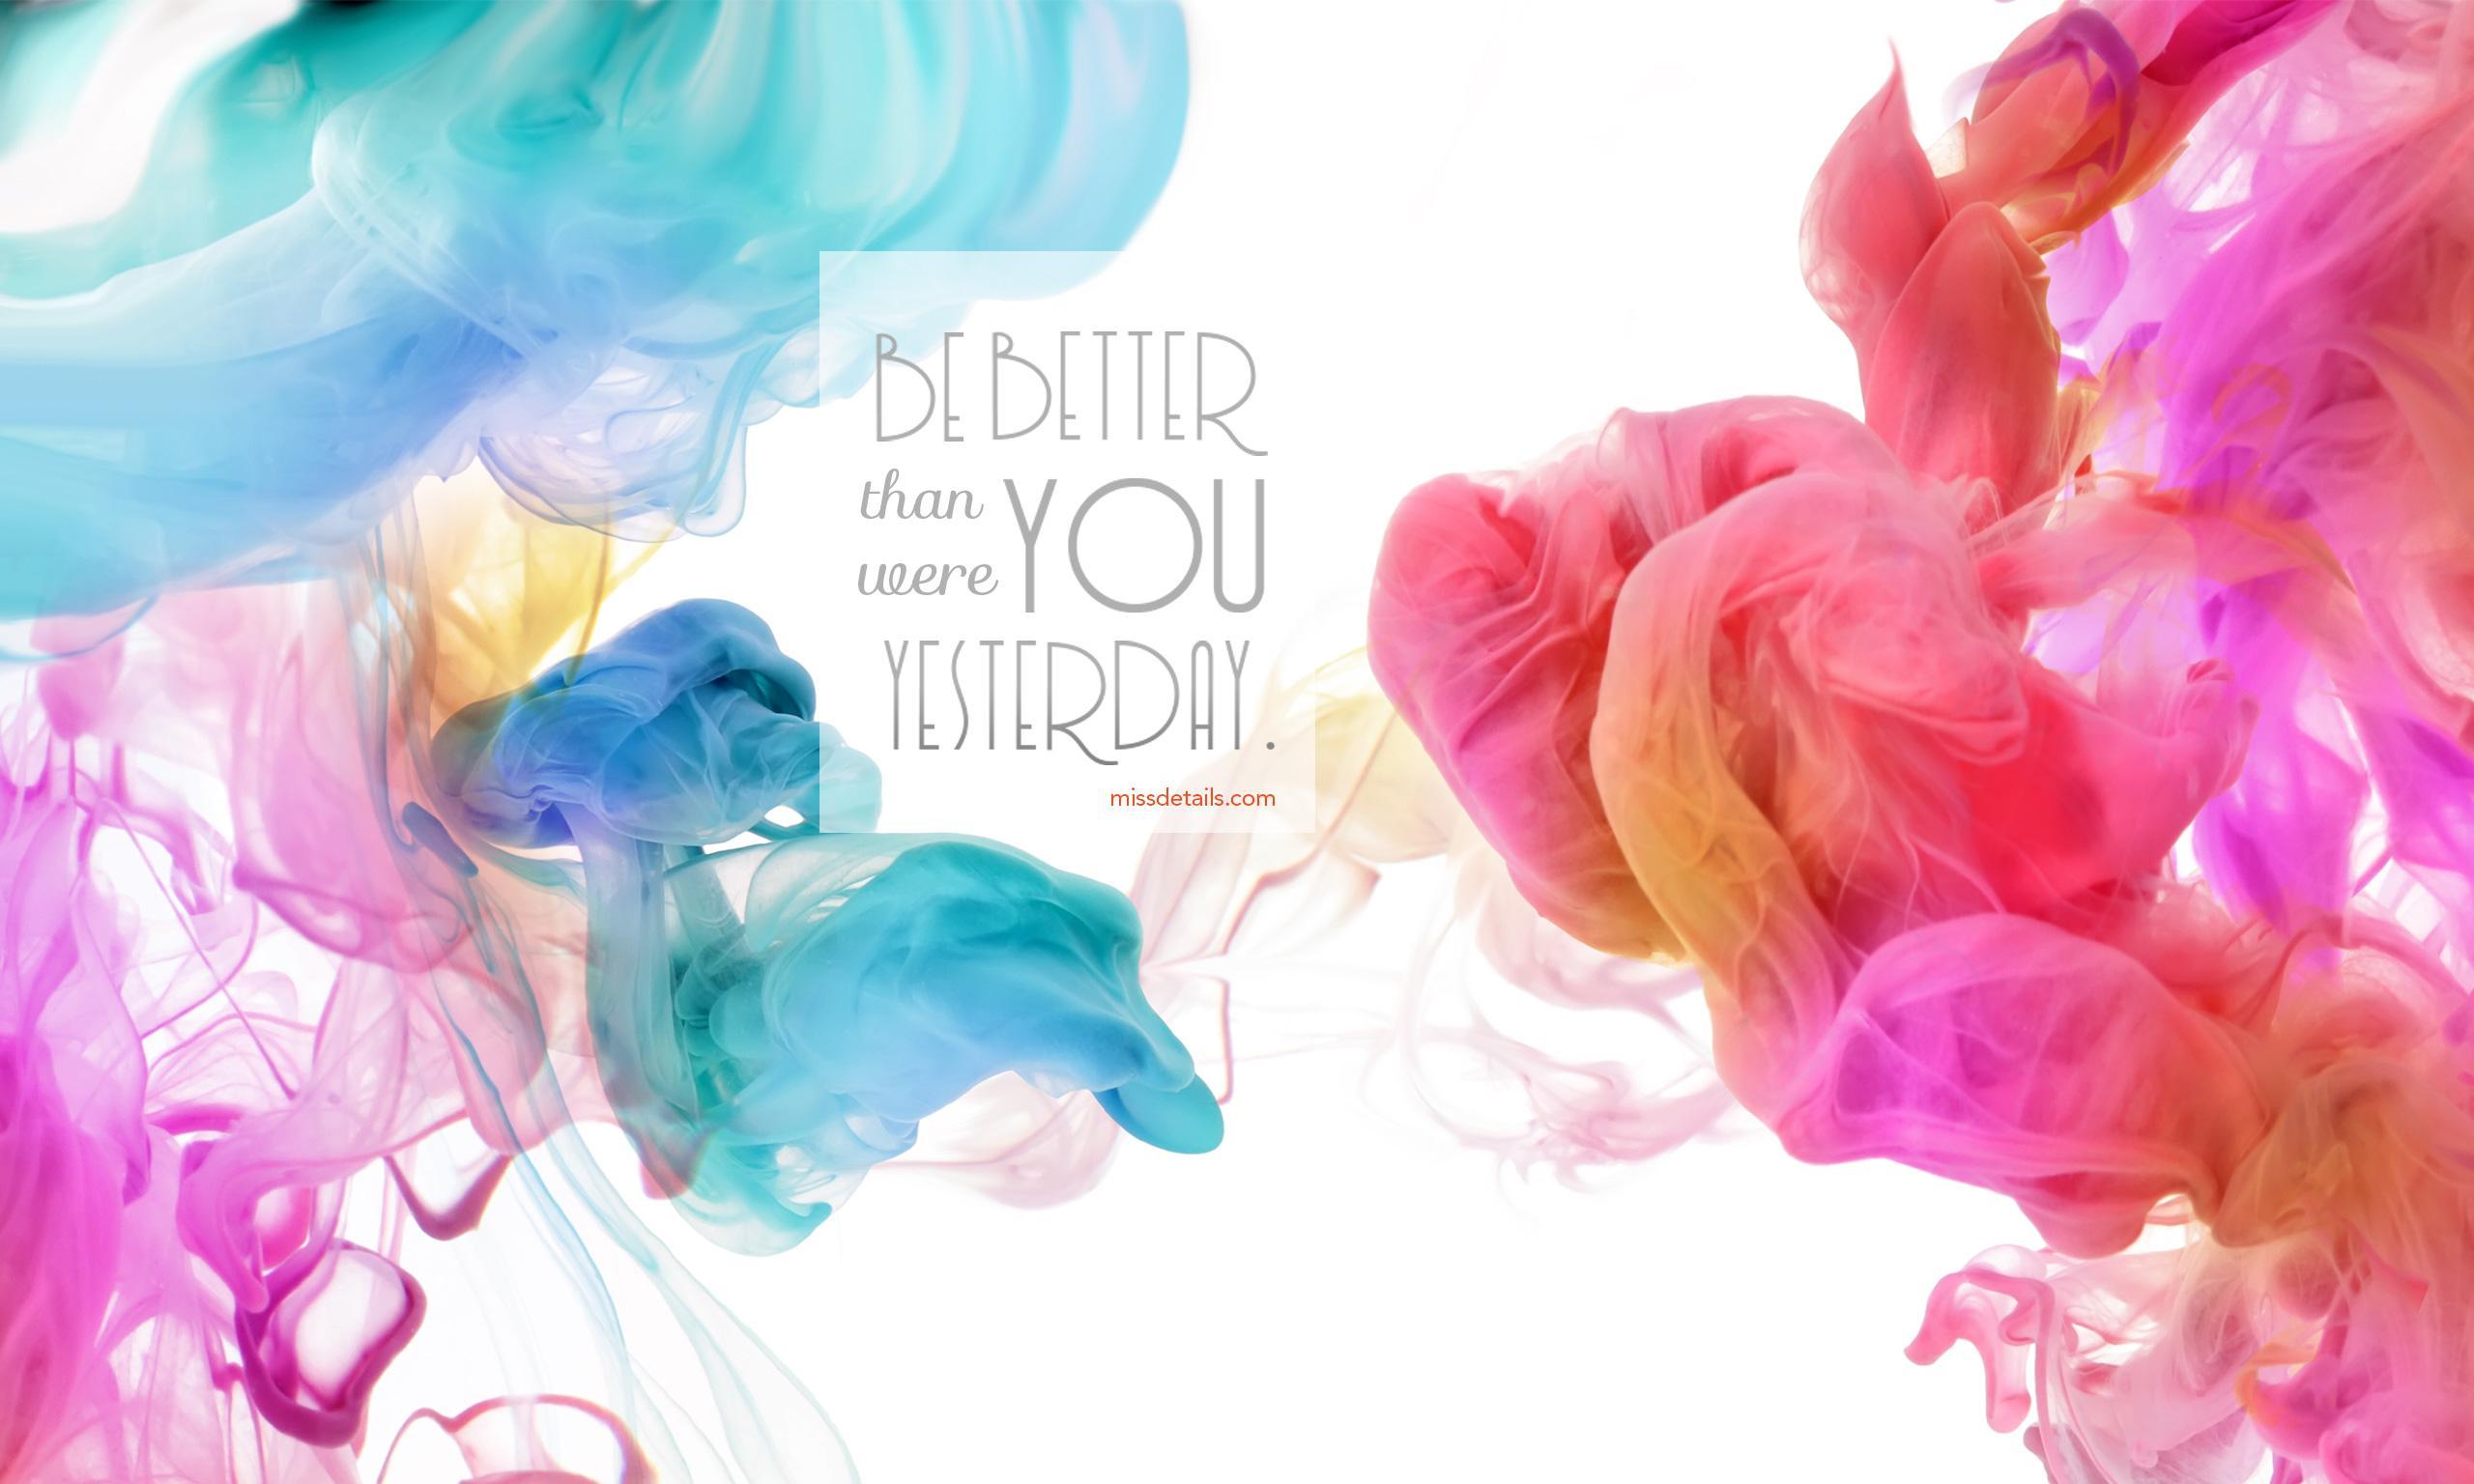 Desktop Wallpaper Quotes Inspirational Quotes Desktop Background 2189345 Hd Wallpaper Backgrounds Download